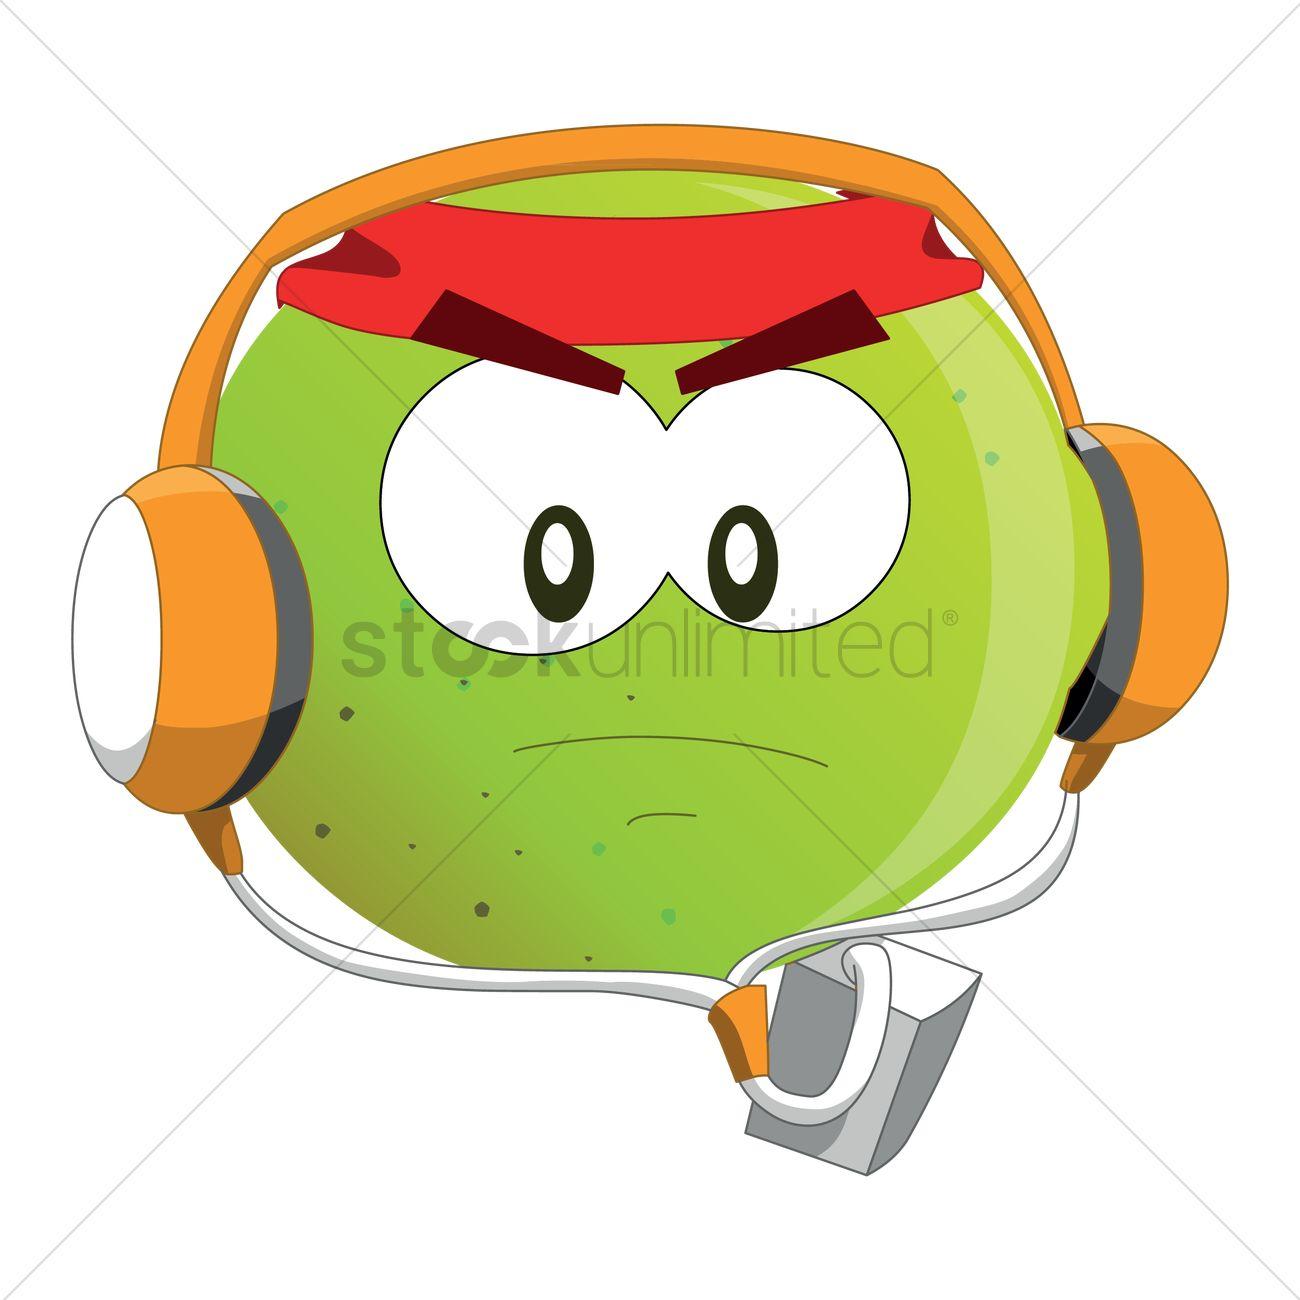 1300x1300 Free Guava Cartoon Listening To Music Vector Image